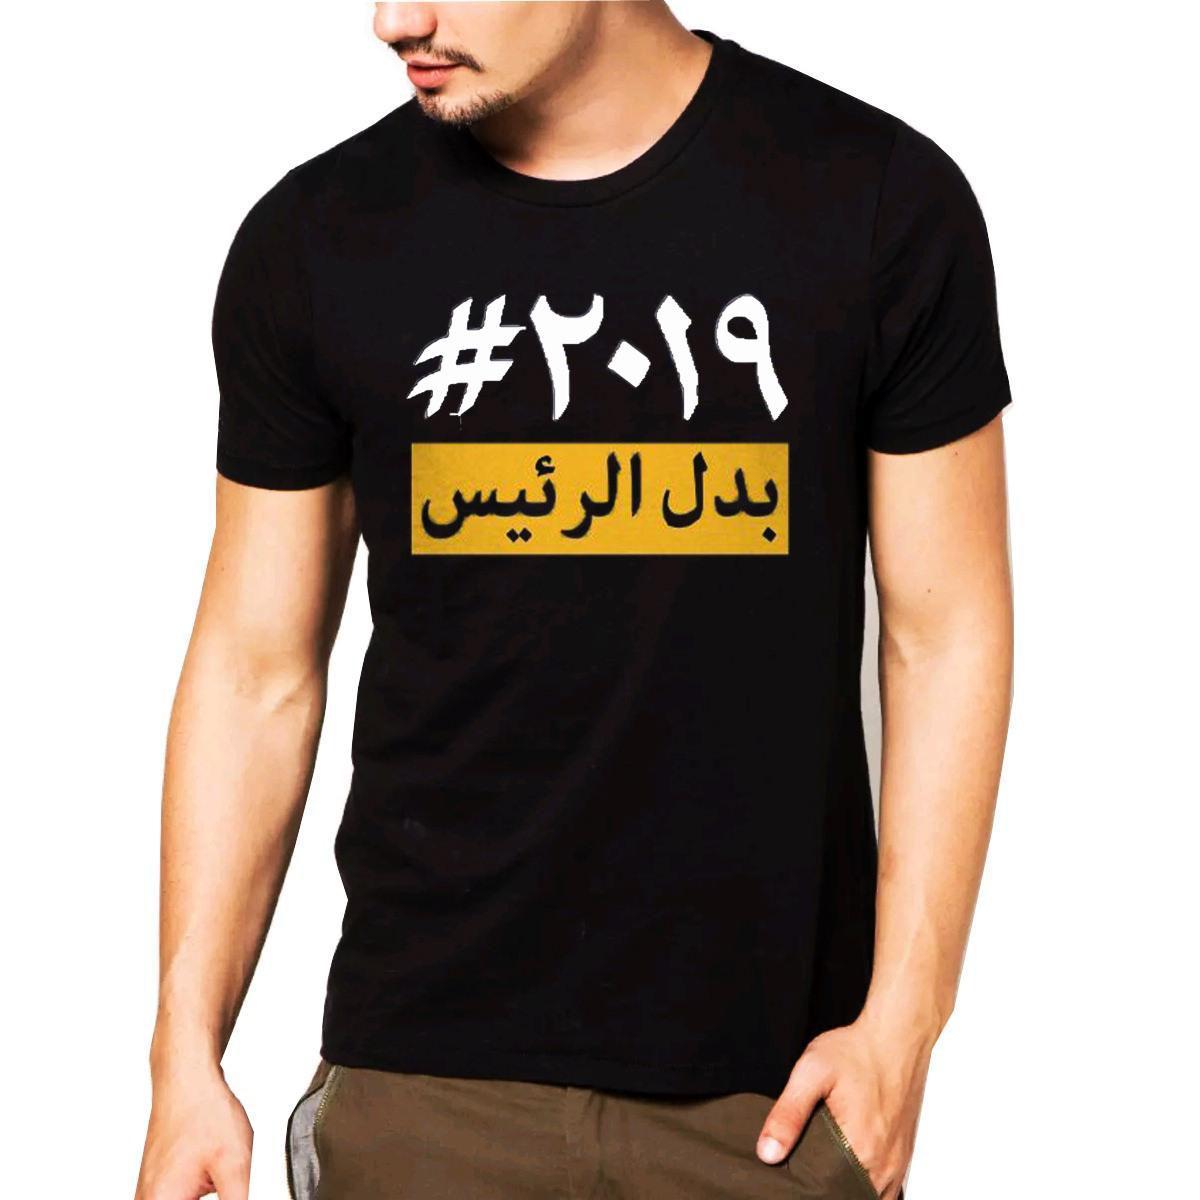 Kaos ganti presiden 2019 versi Arab terbaru buy 3 get 1 topi 31b5c6a003